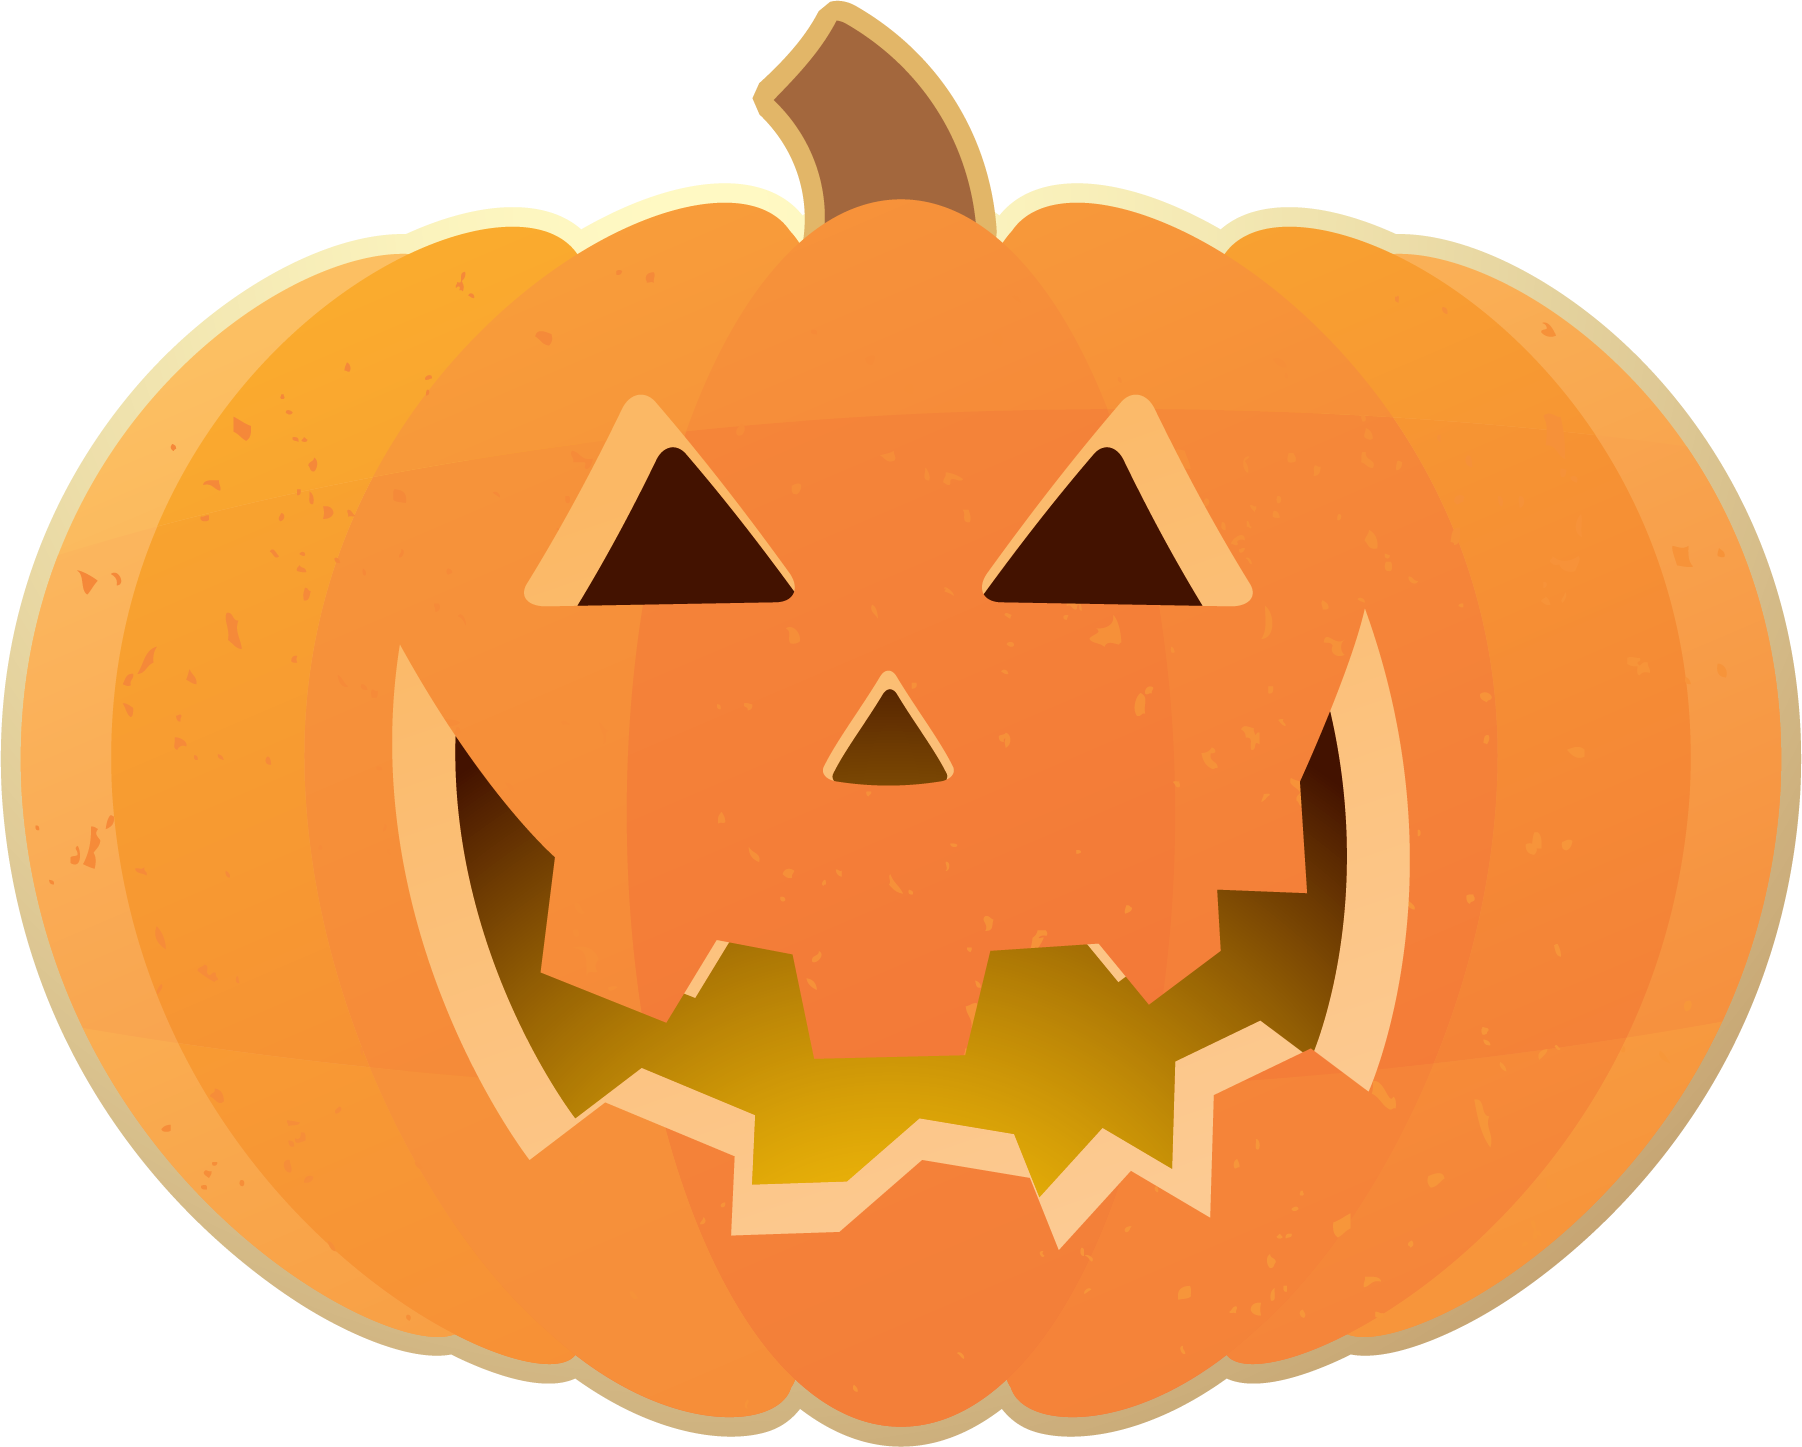 1802x1447 Transparent Pumpkin Clipart